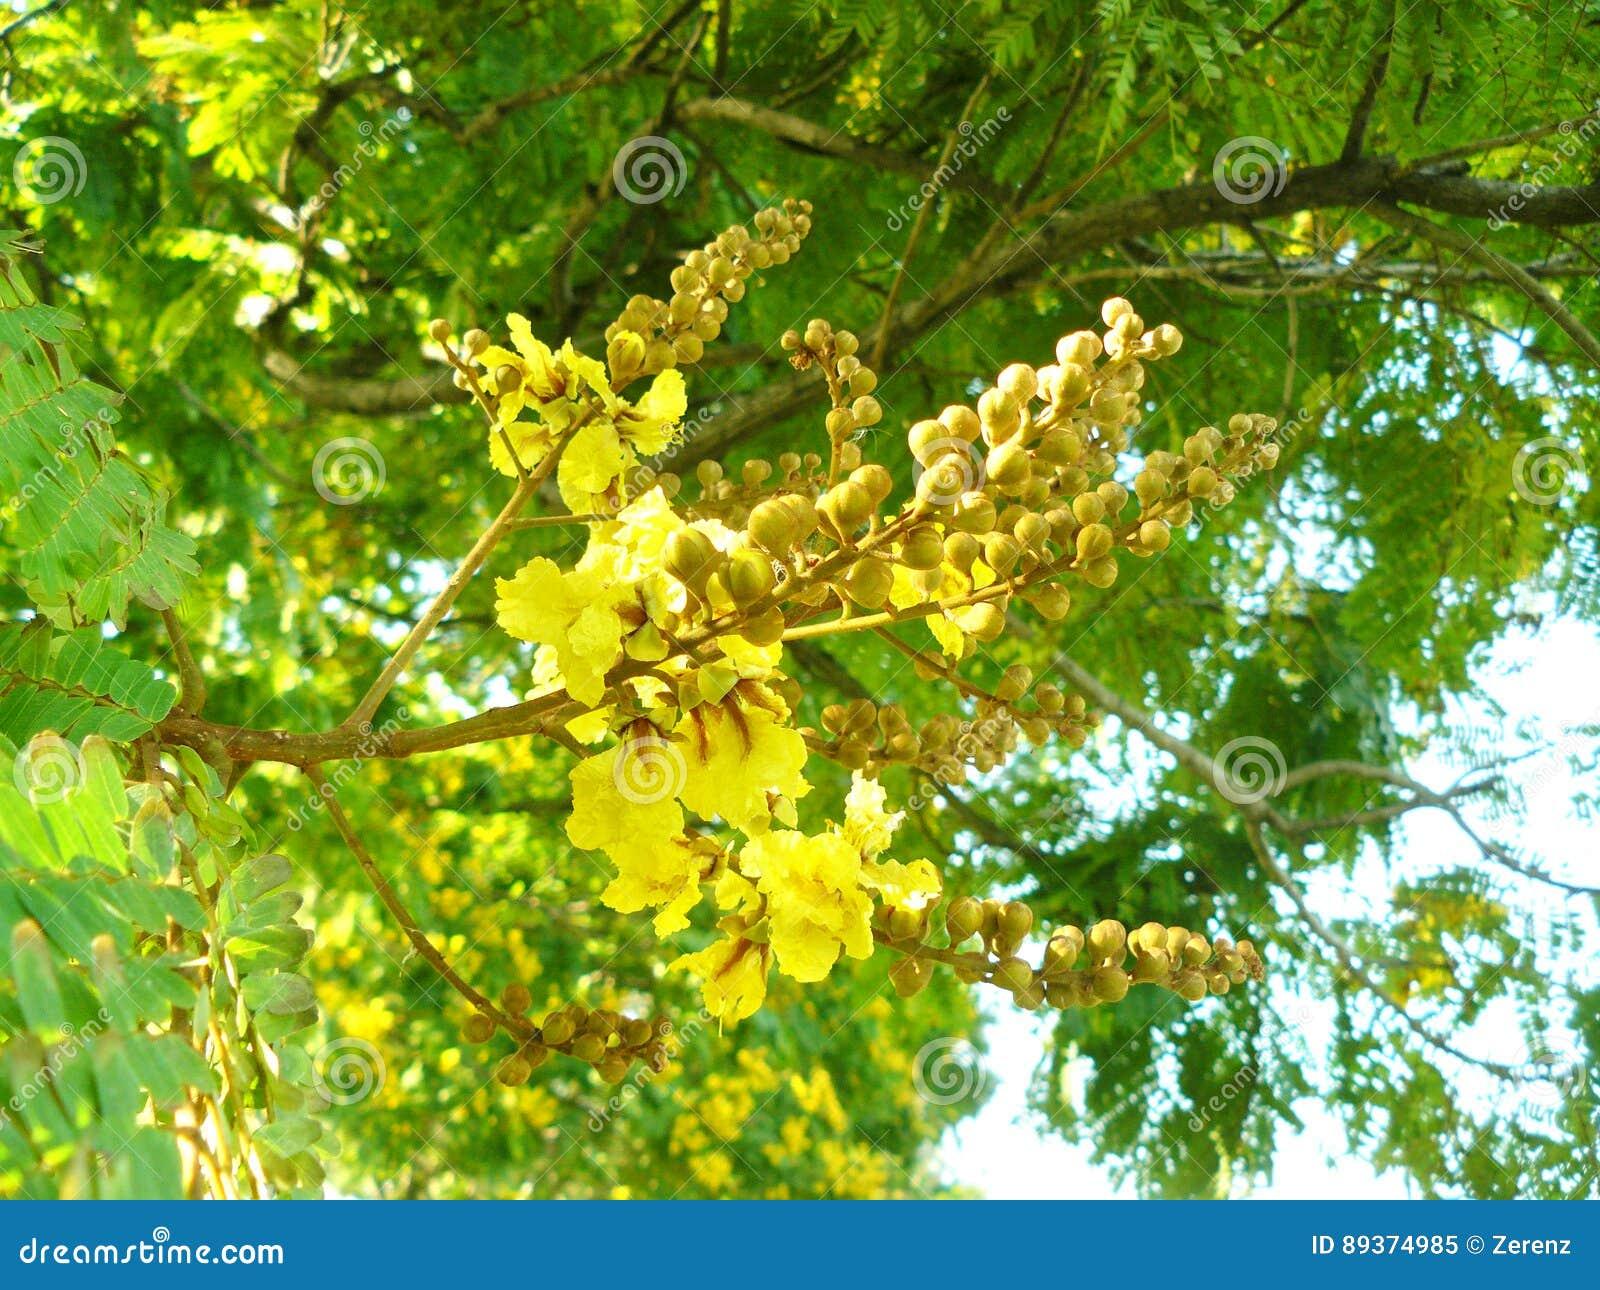 Copper pod flower on the tree stock image image of heyne close up of copper pod flower on the tree x28 yellow flame yellow poinciana or peltophorum pterocarpum x28dc x29 kheyne x29 beautiful flower mightylinksfo